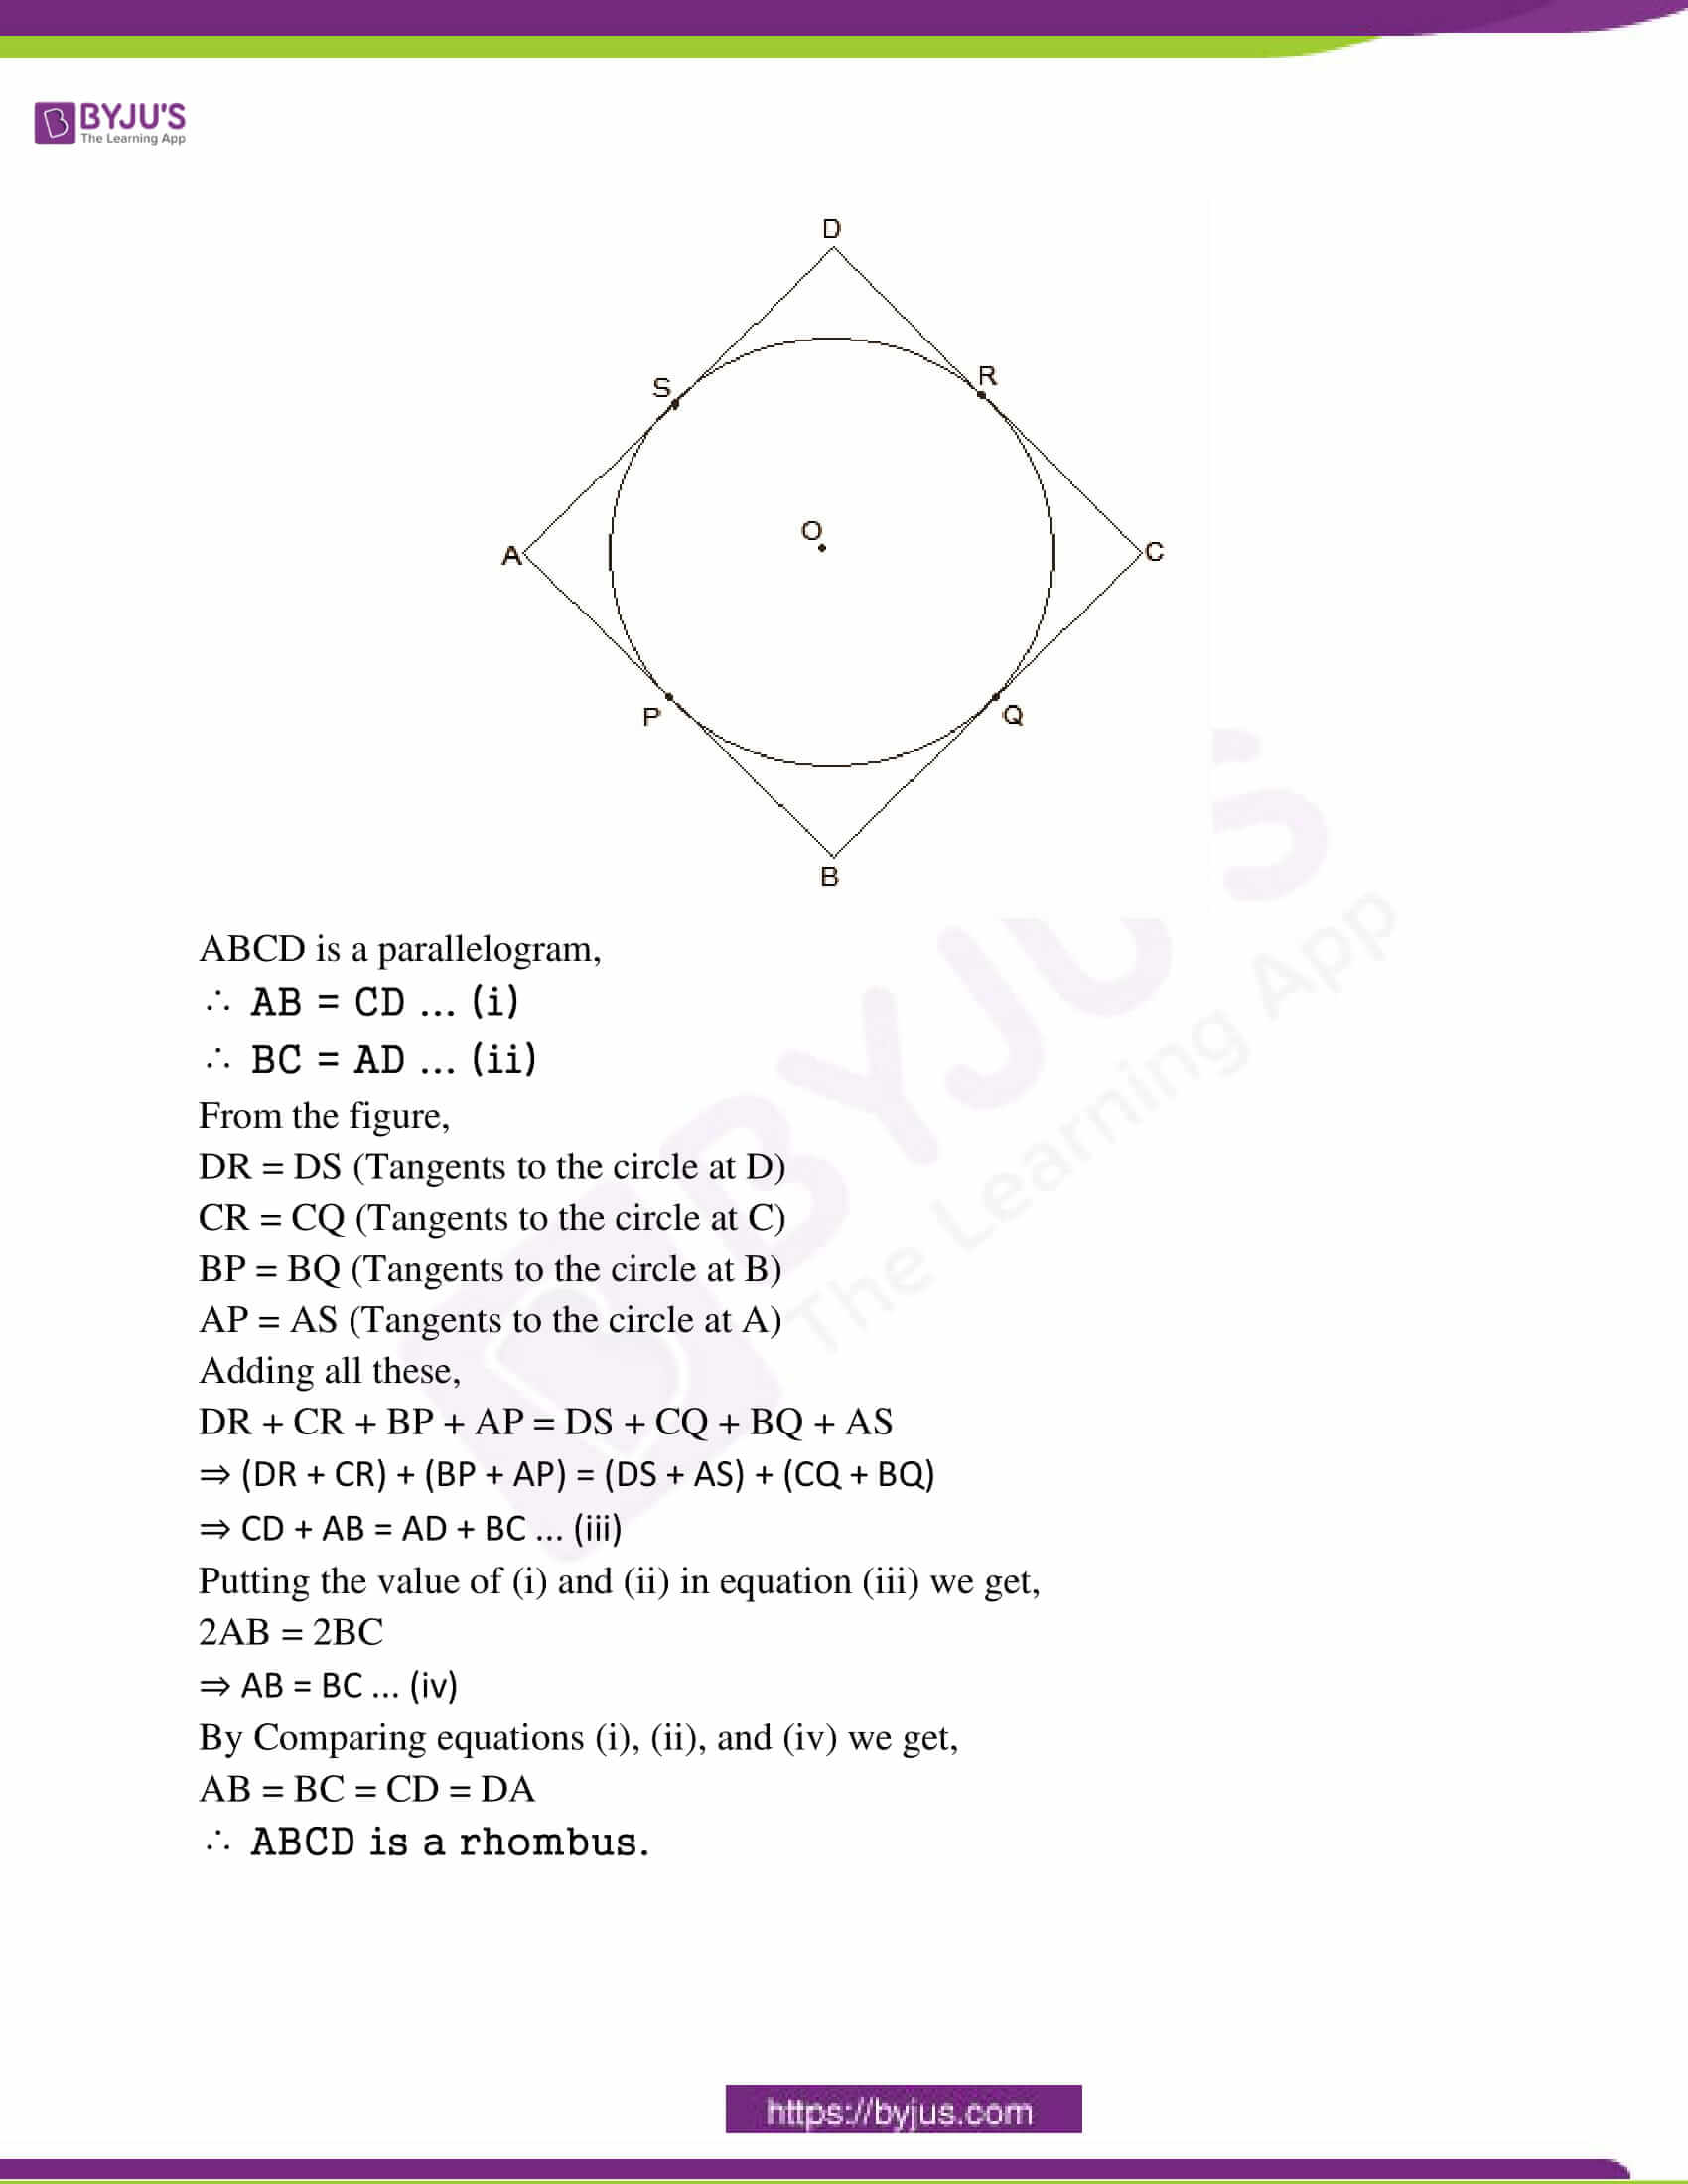 ap class 10 maths question paper 2 sol march 2016 08